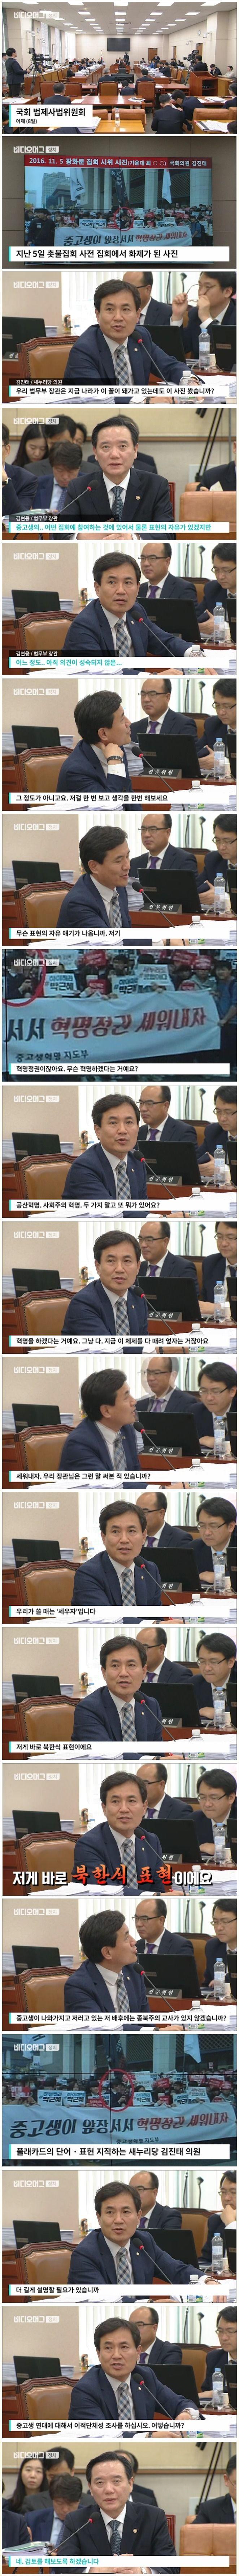 "IMG_0829.JPG 김진태 ""중고생 시위 배후에 종북주의 교사 있는거 아닌가"""